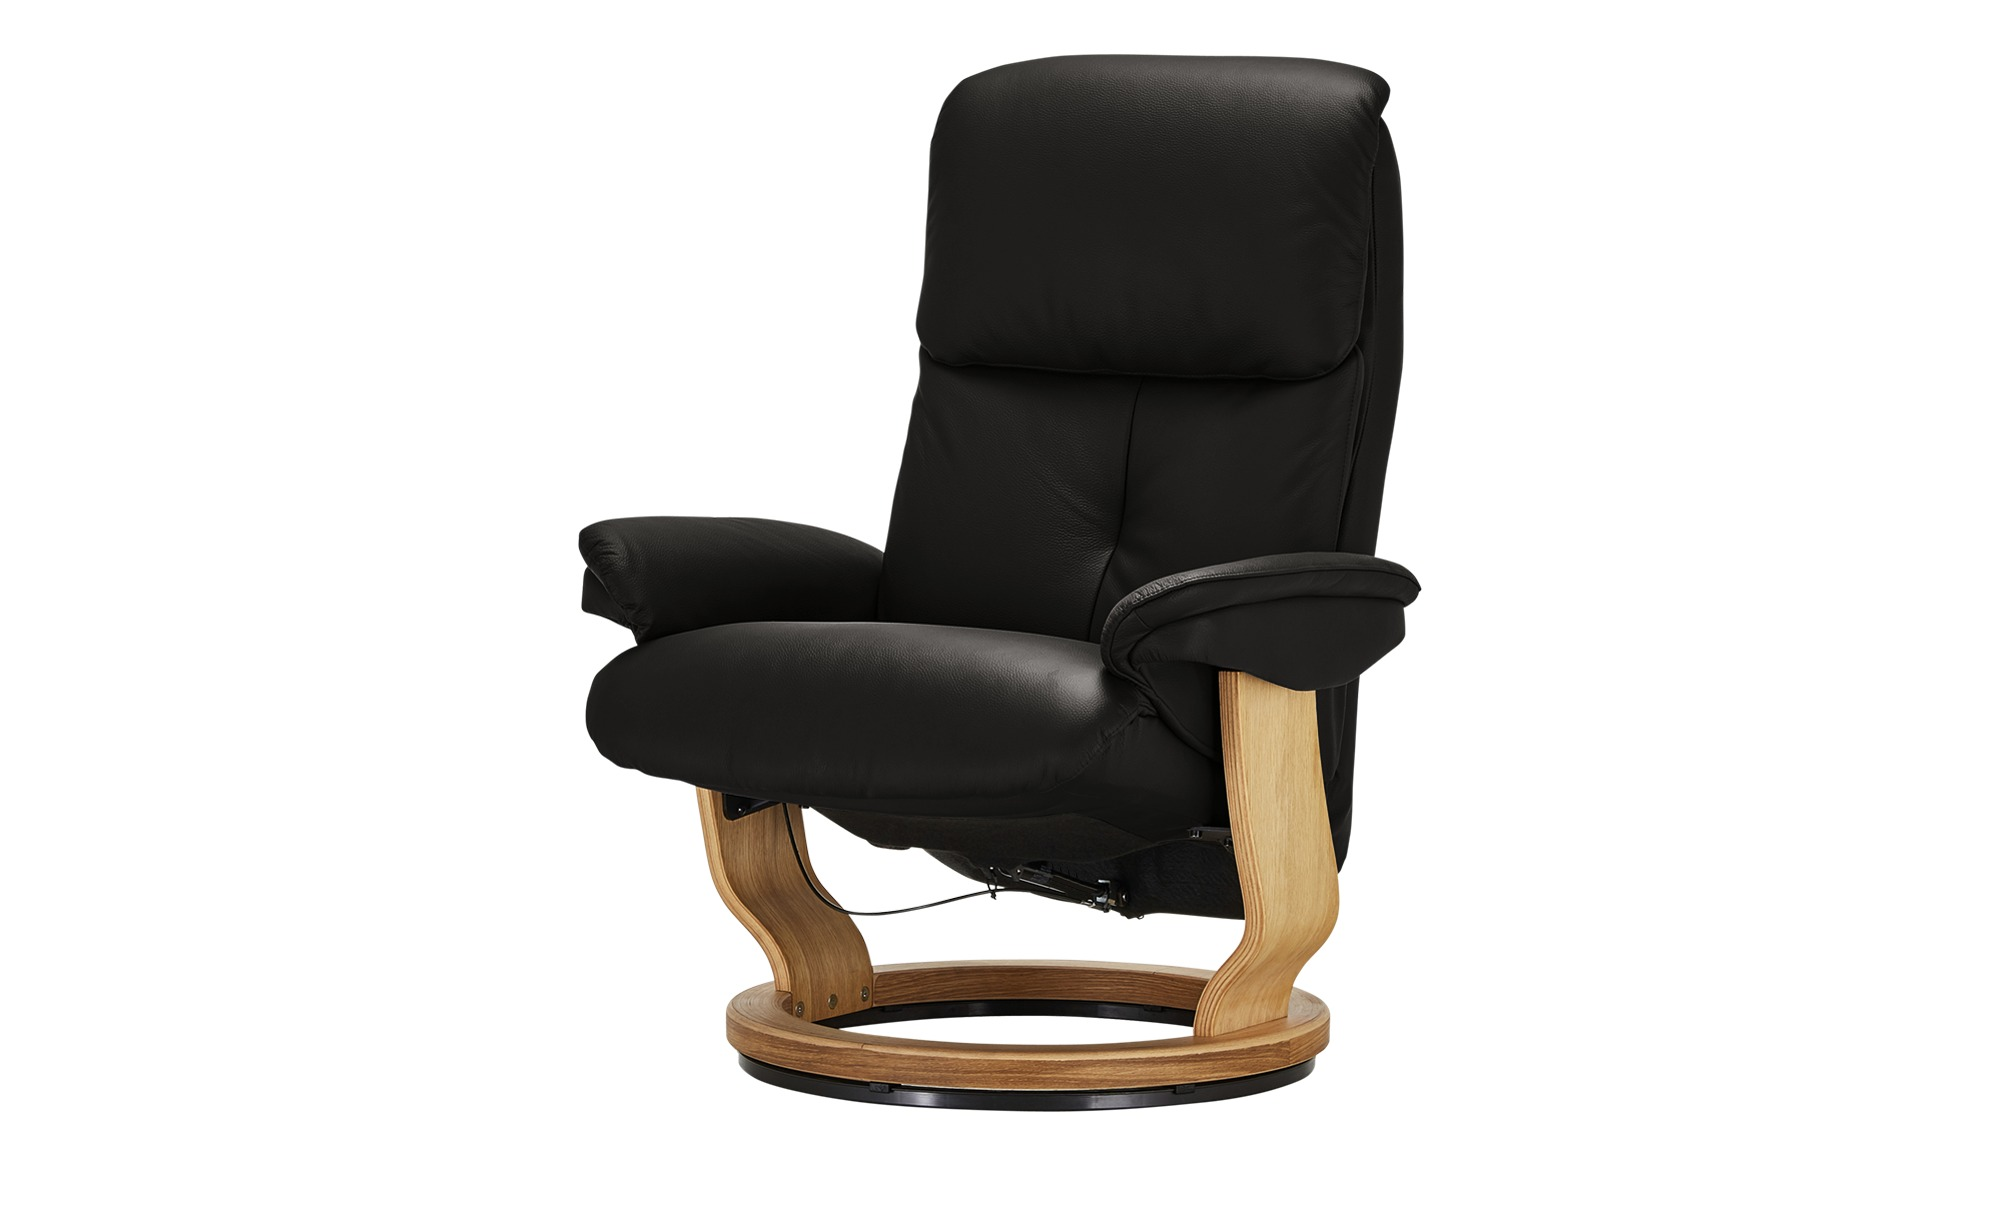 Nils Olsen Relaxsessel  Farso ¦ braun ¦ Maße (cm): B: 85 H: 114 T: 92 Polstermöbel > Sessel > Drehsessel - Höffner